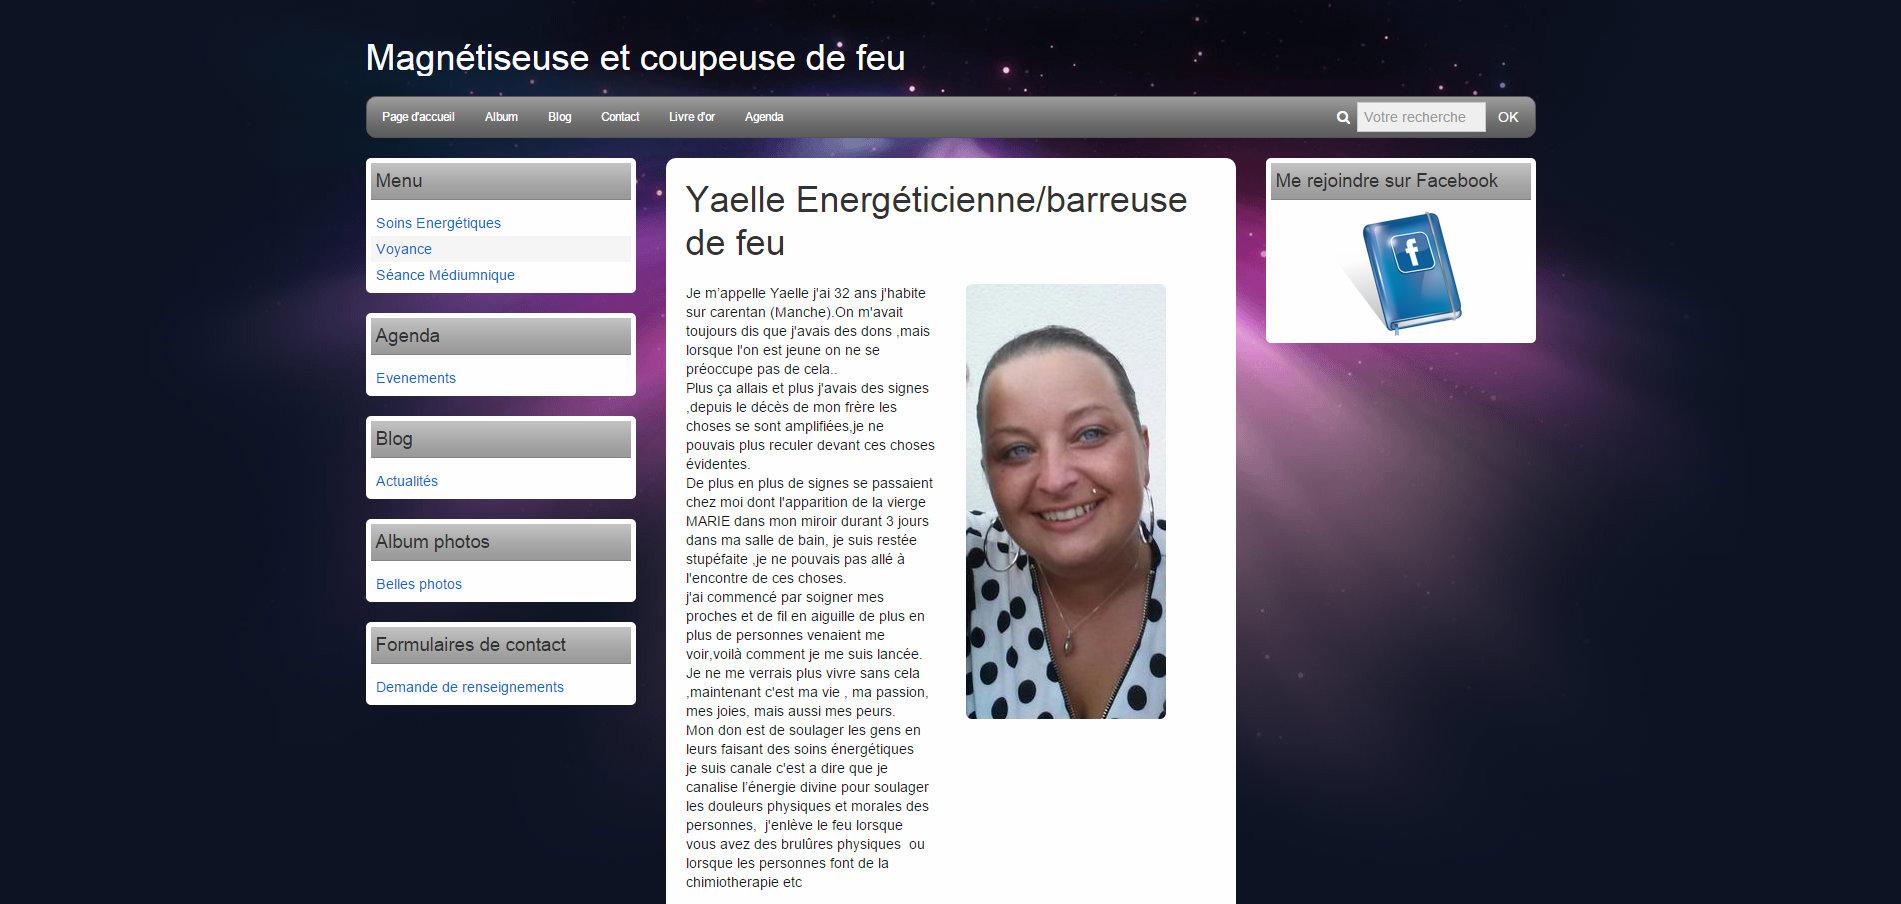 Yaëlle Energéticienne/barreuse de feu